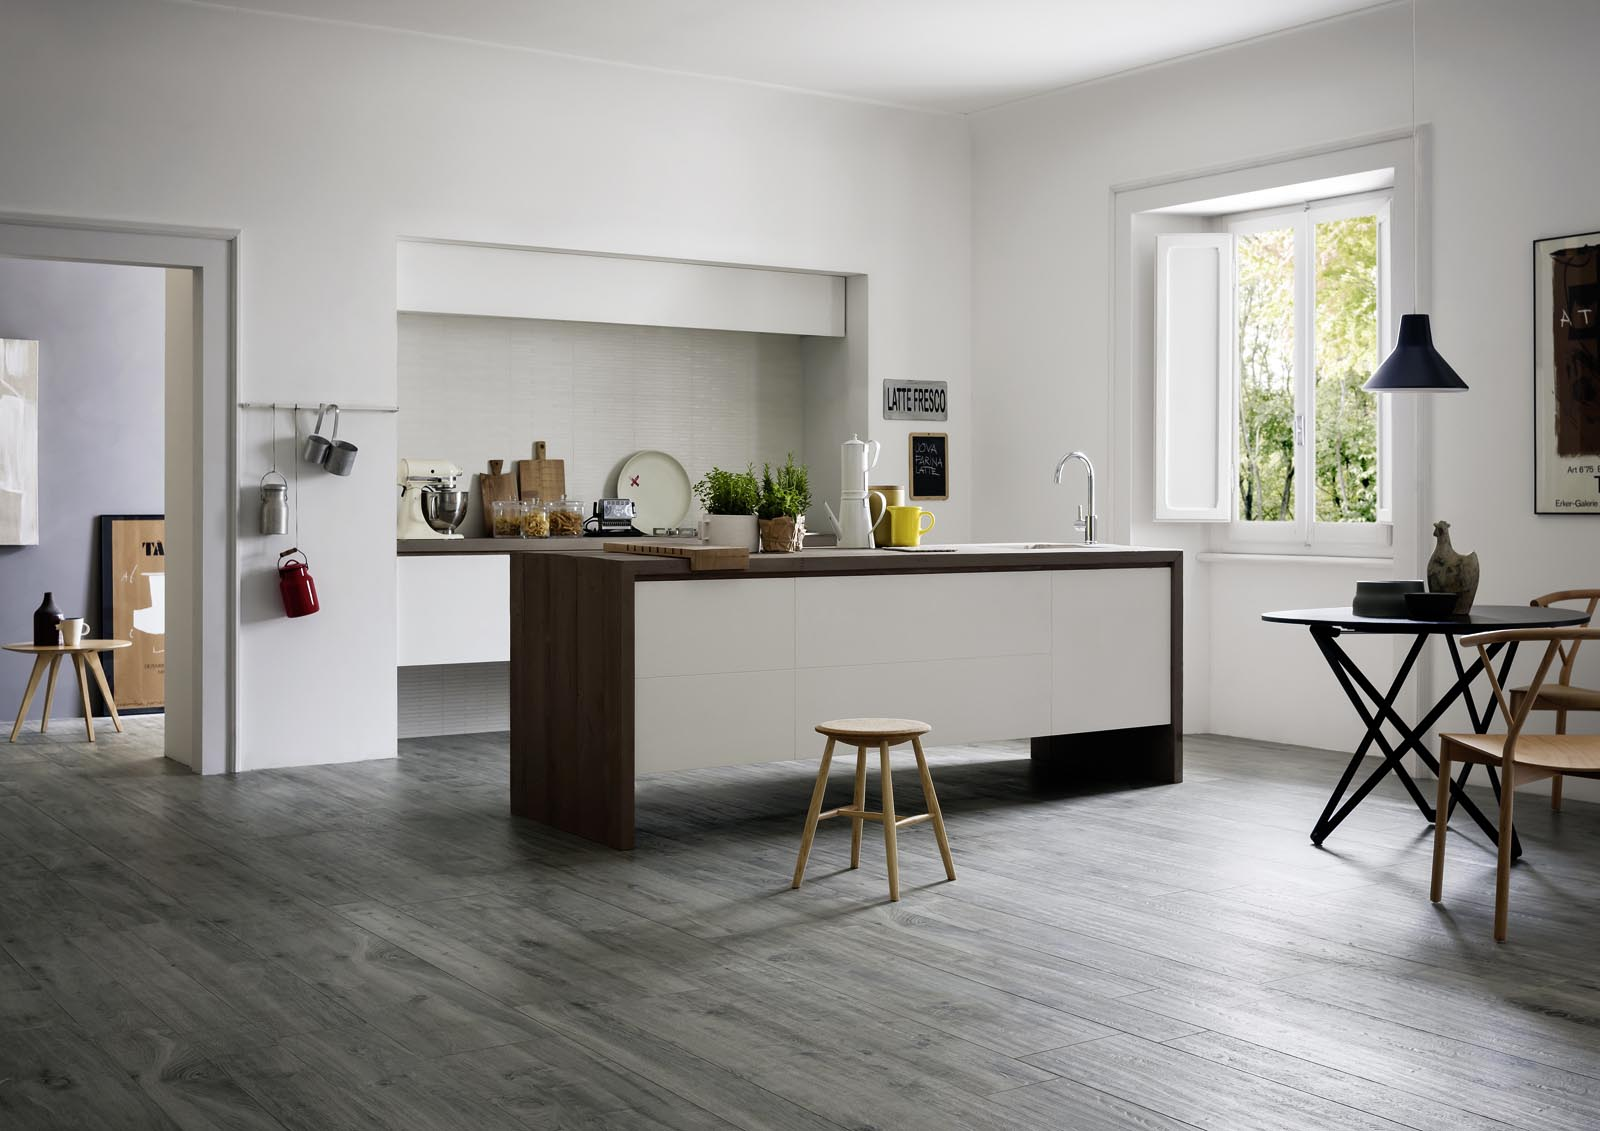 Kitchen Wall And Floor Tiles Marazzi